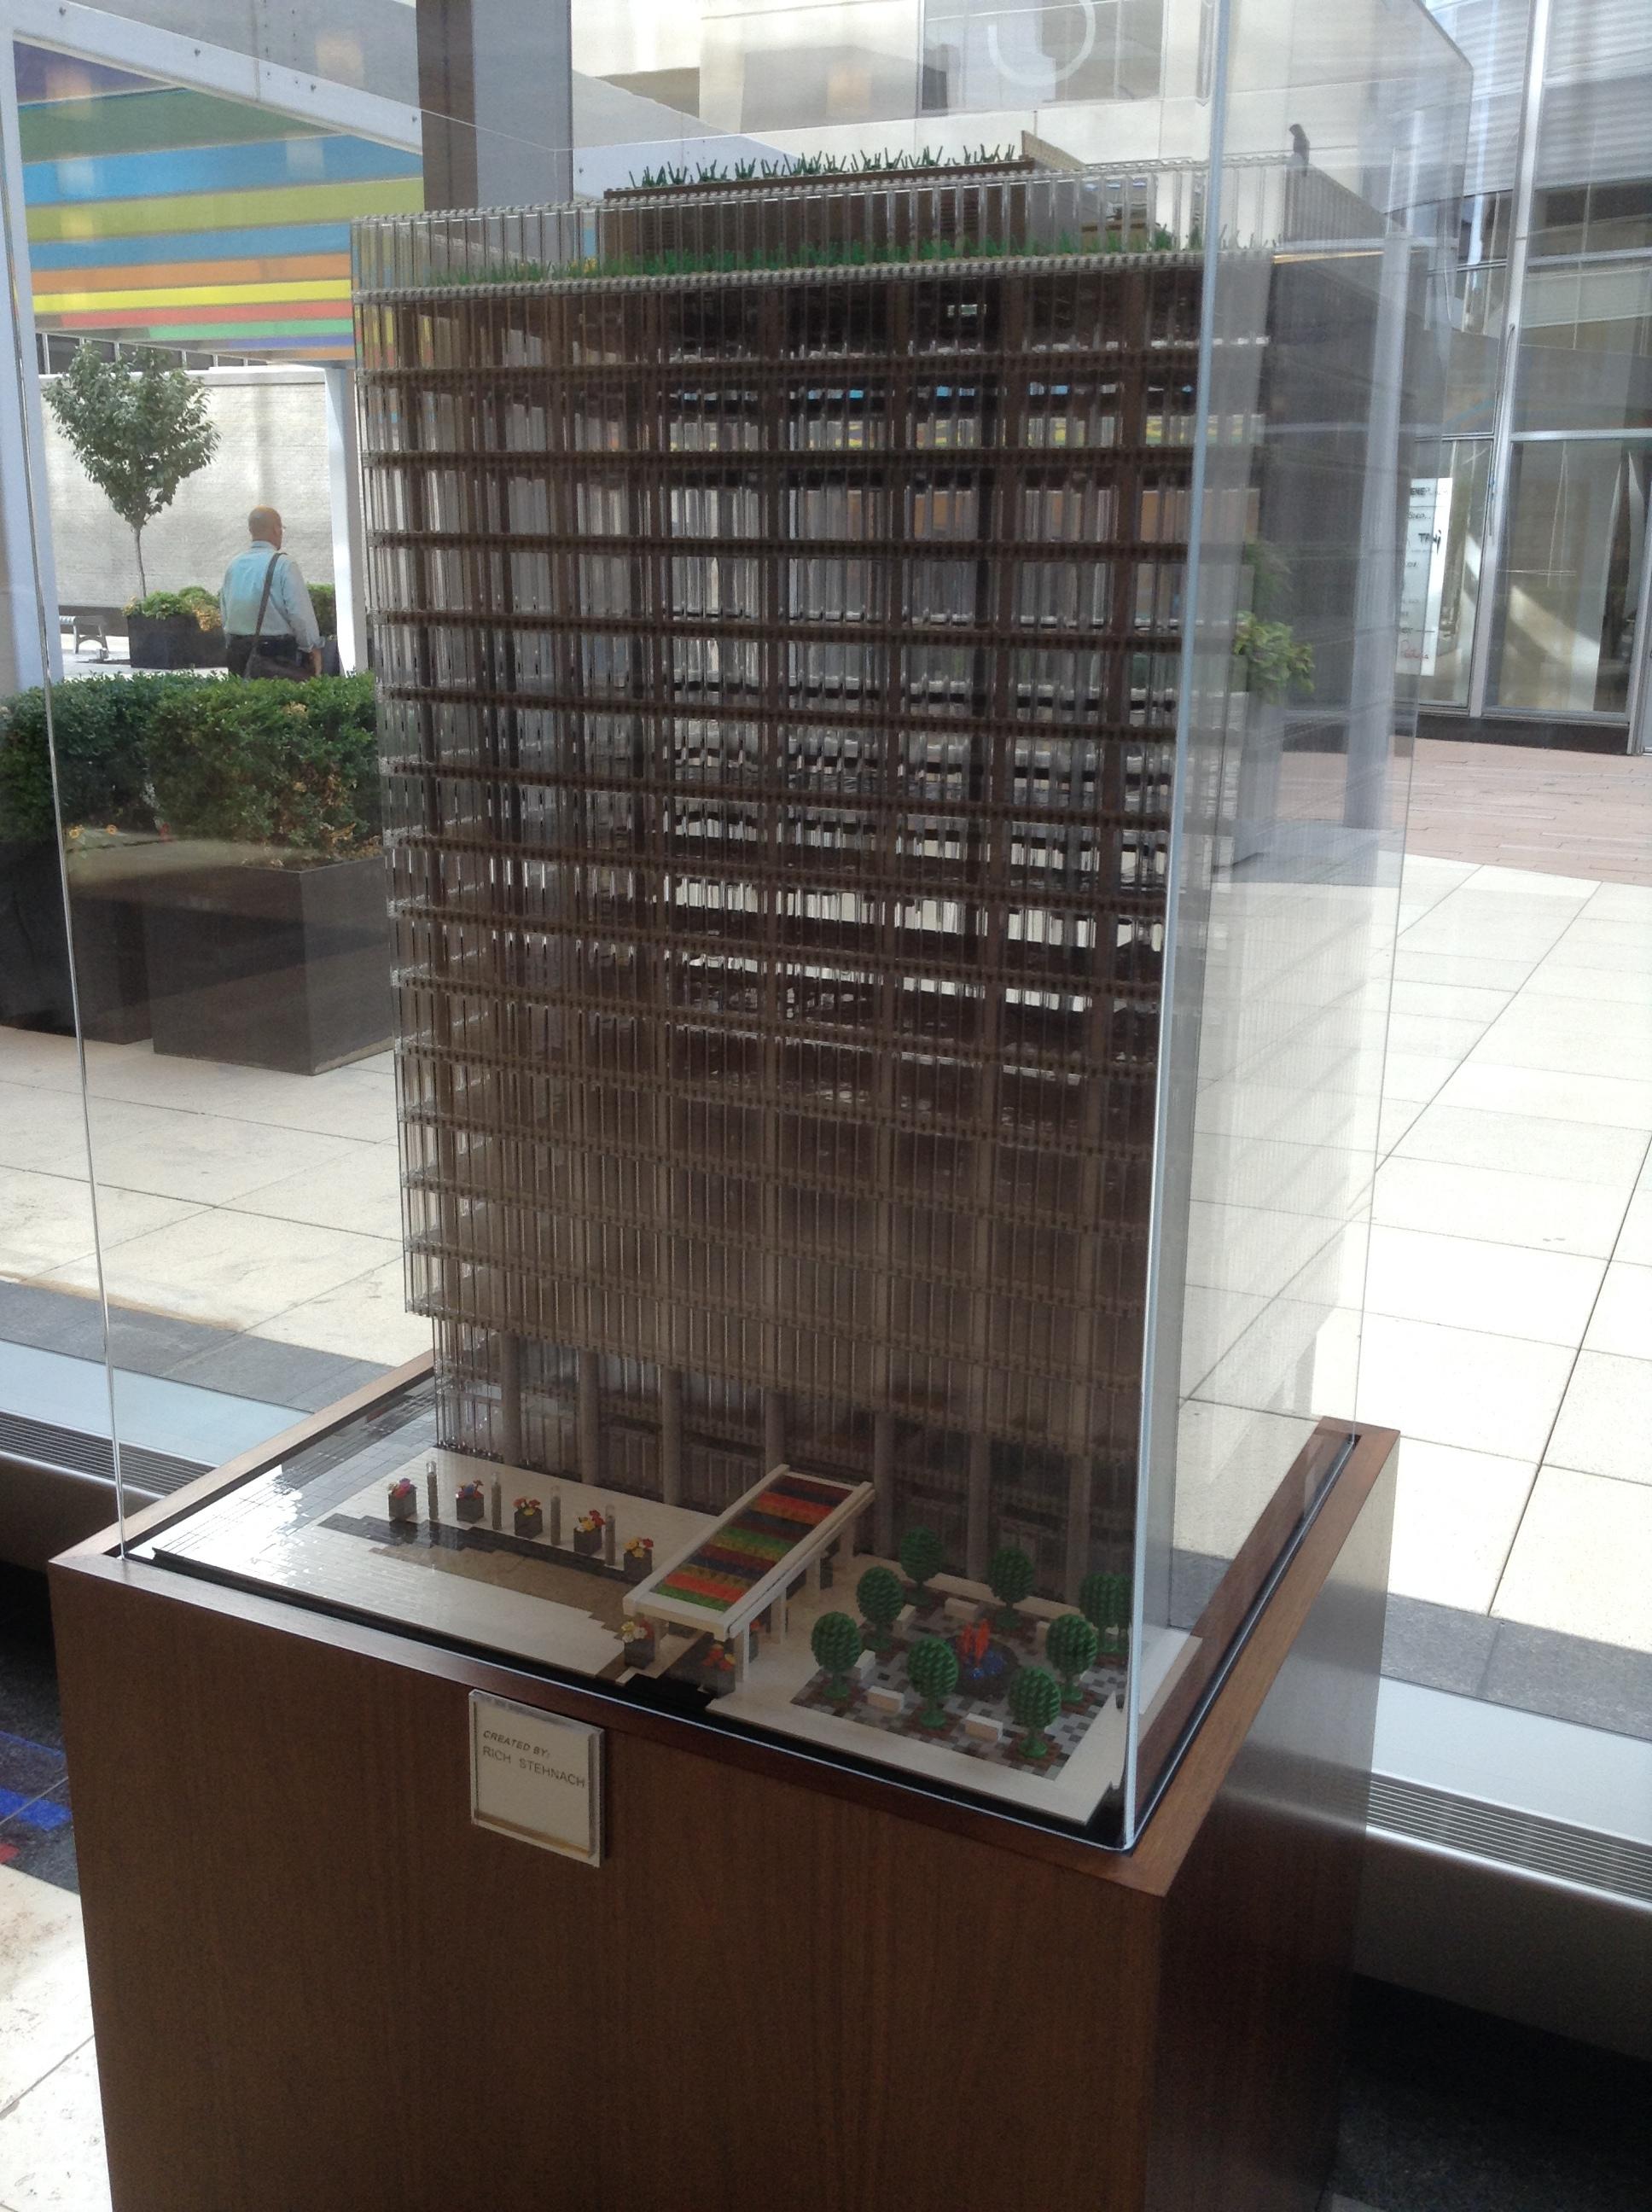 MOC of Centene corporate headquarters inside Centene's corporate headquarters.